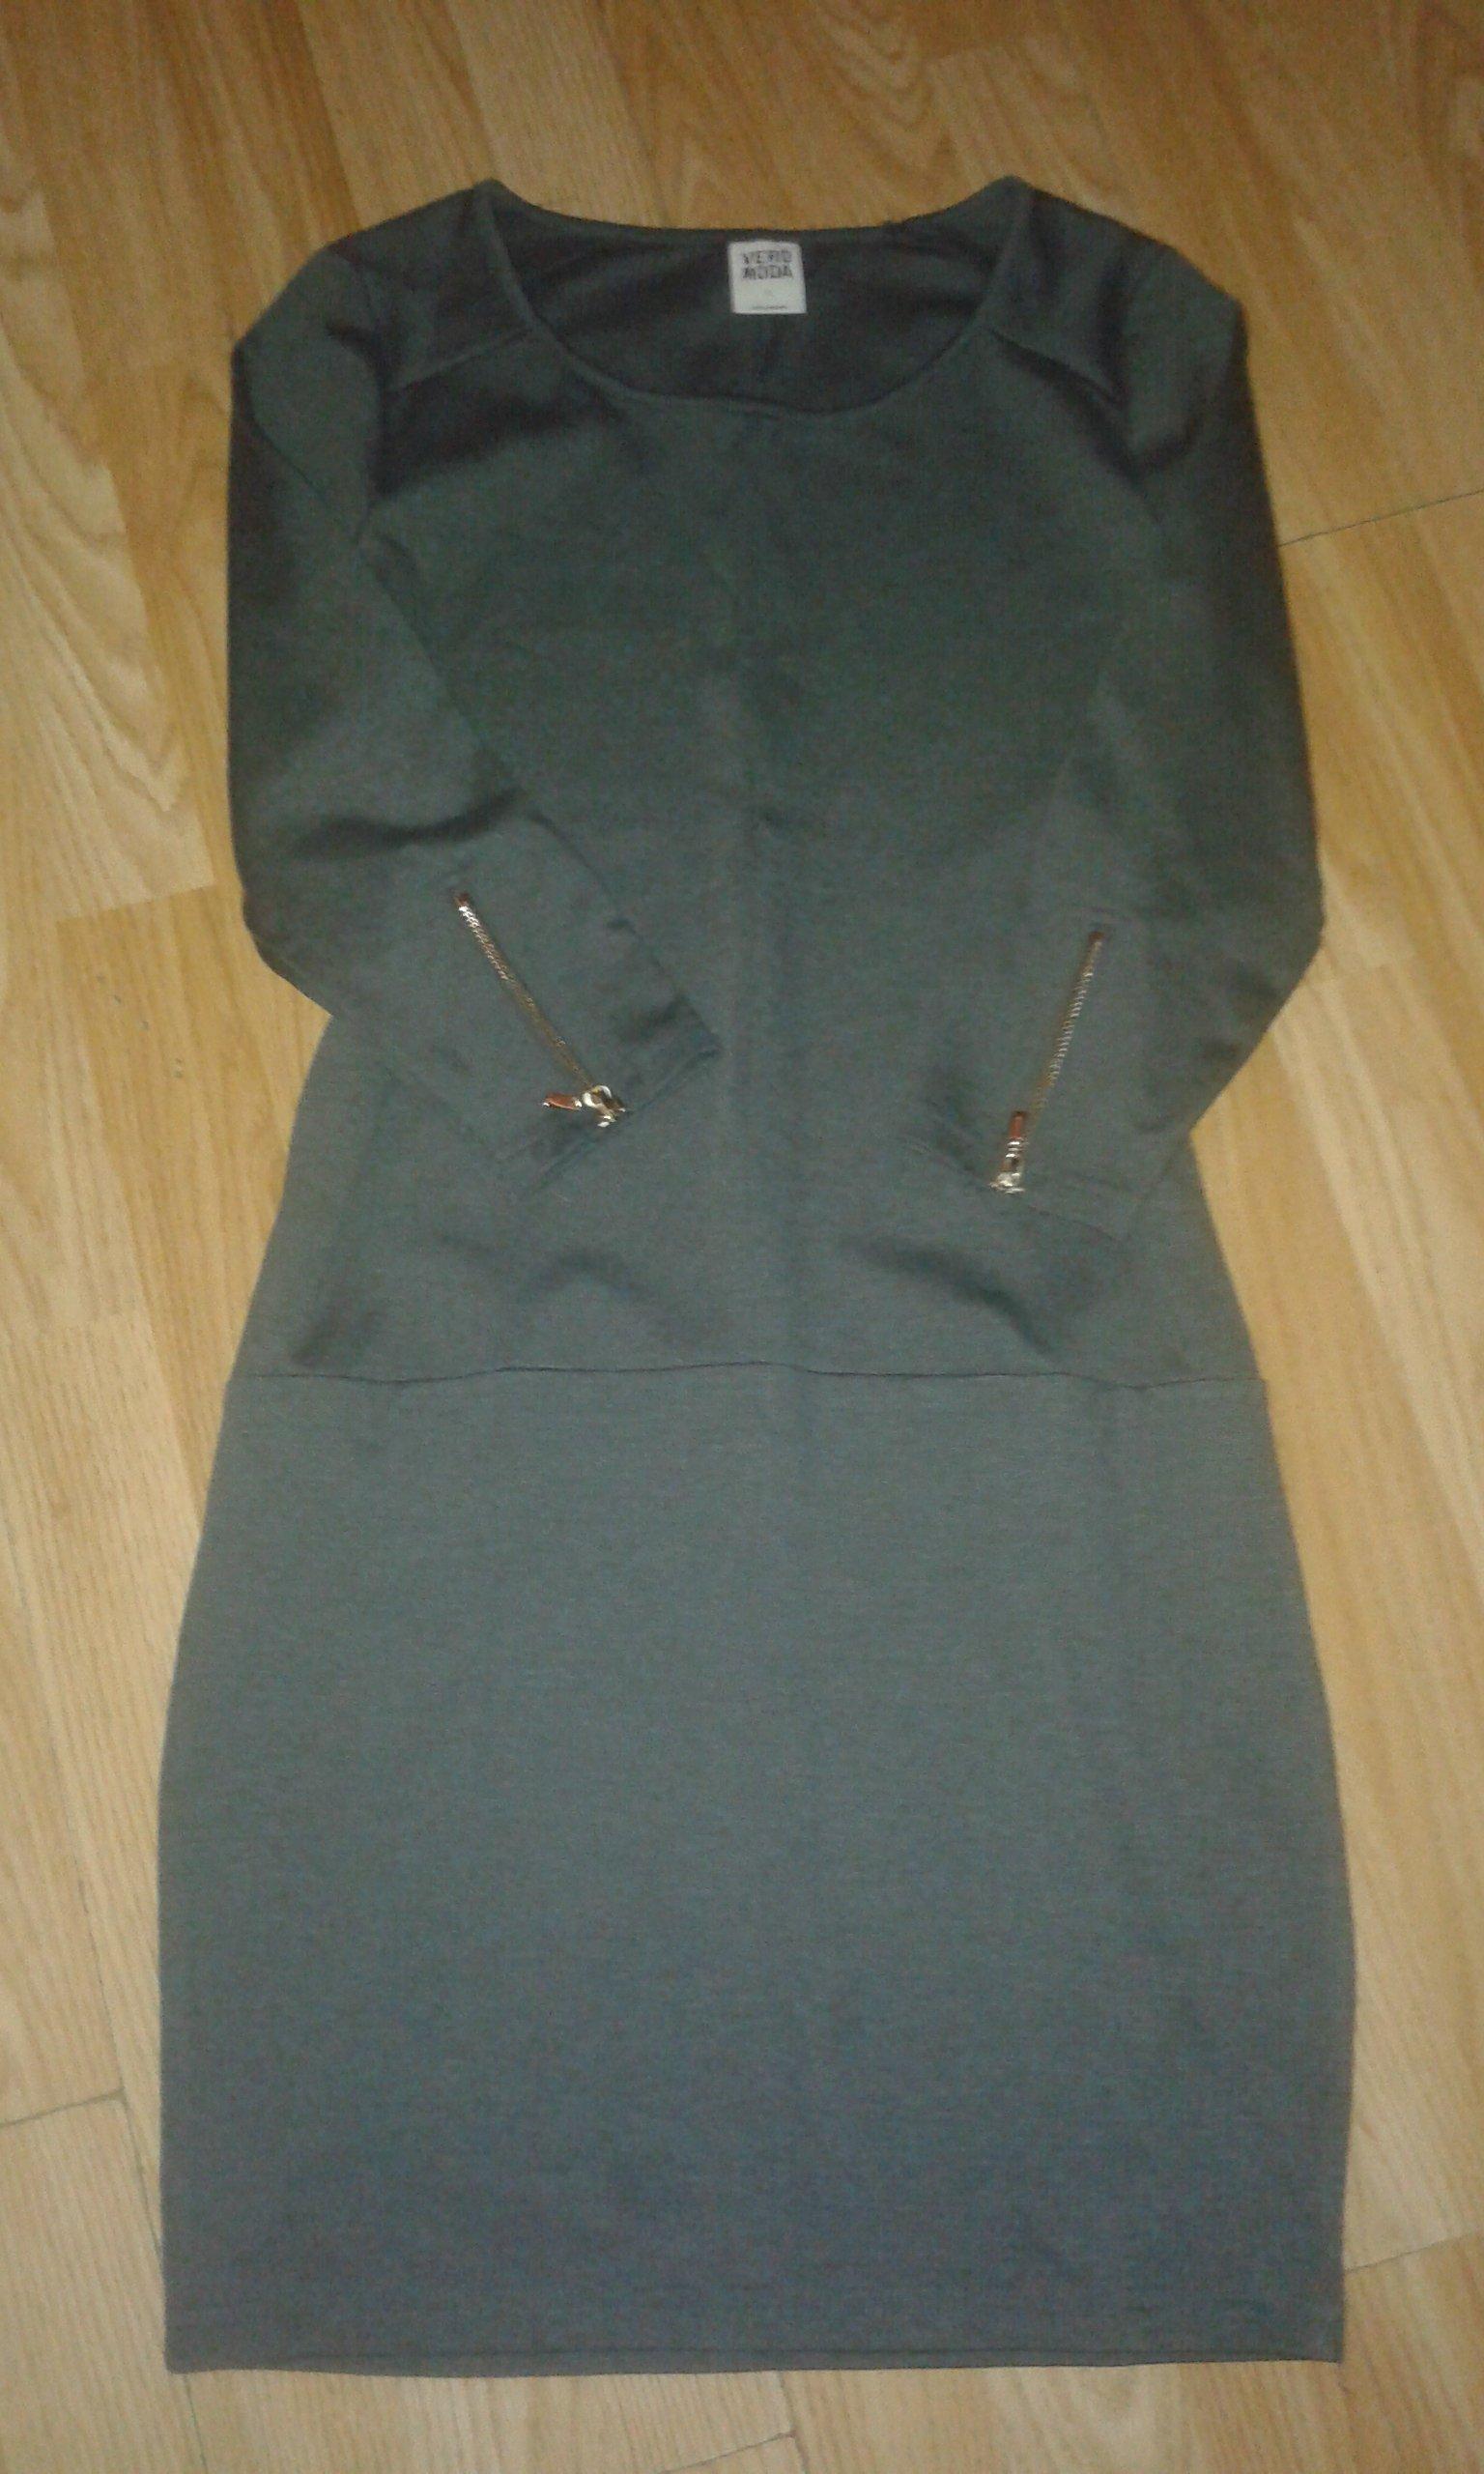 5de99043cc VERO MODA sukienka S - 7311097623 - oficjalne archiwum allegro